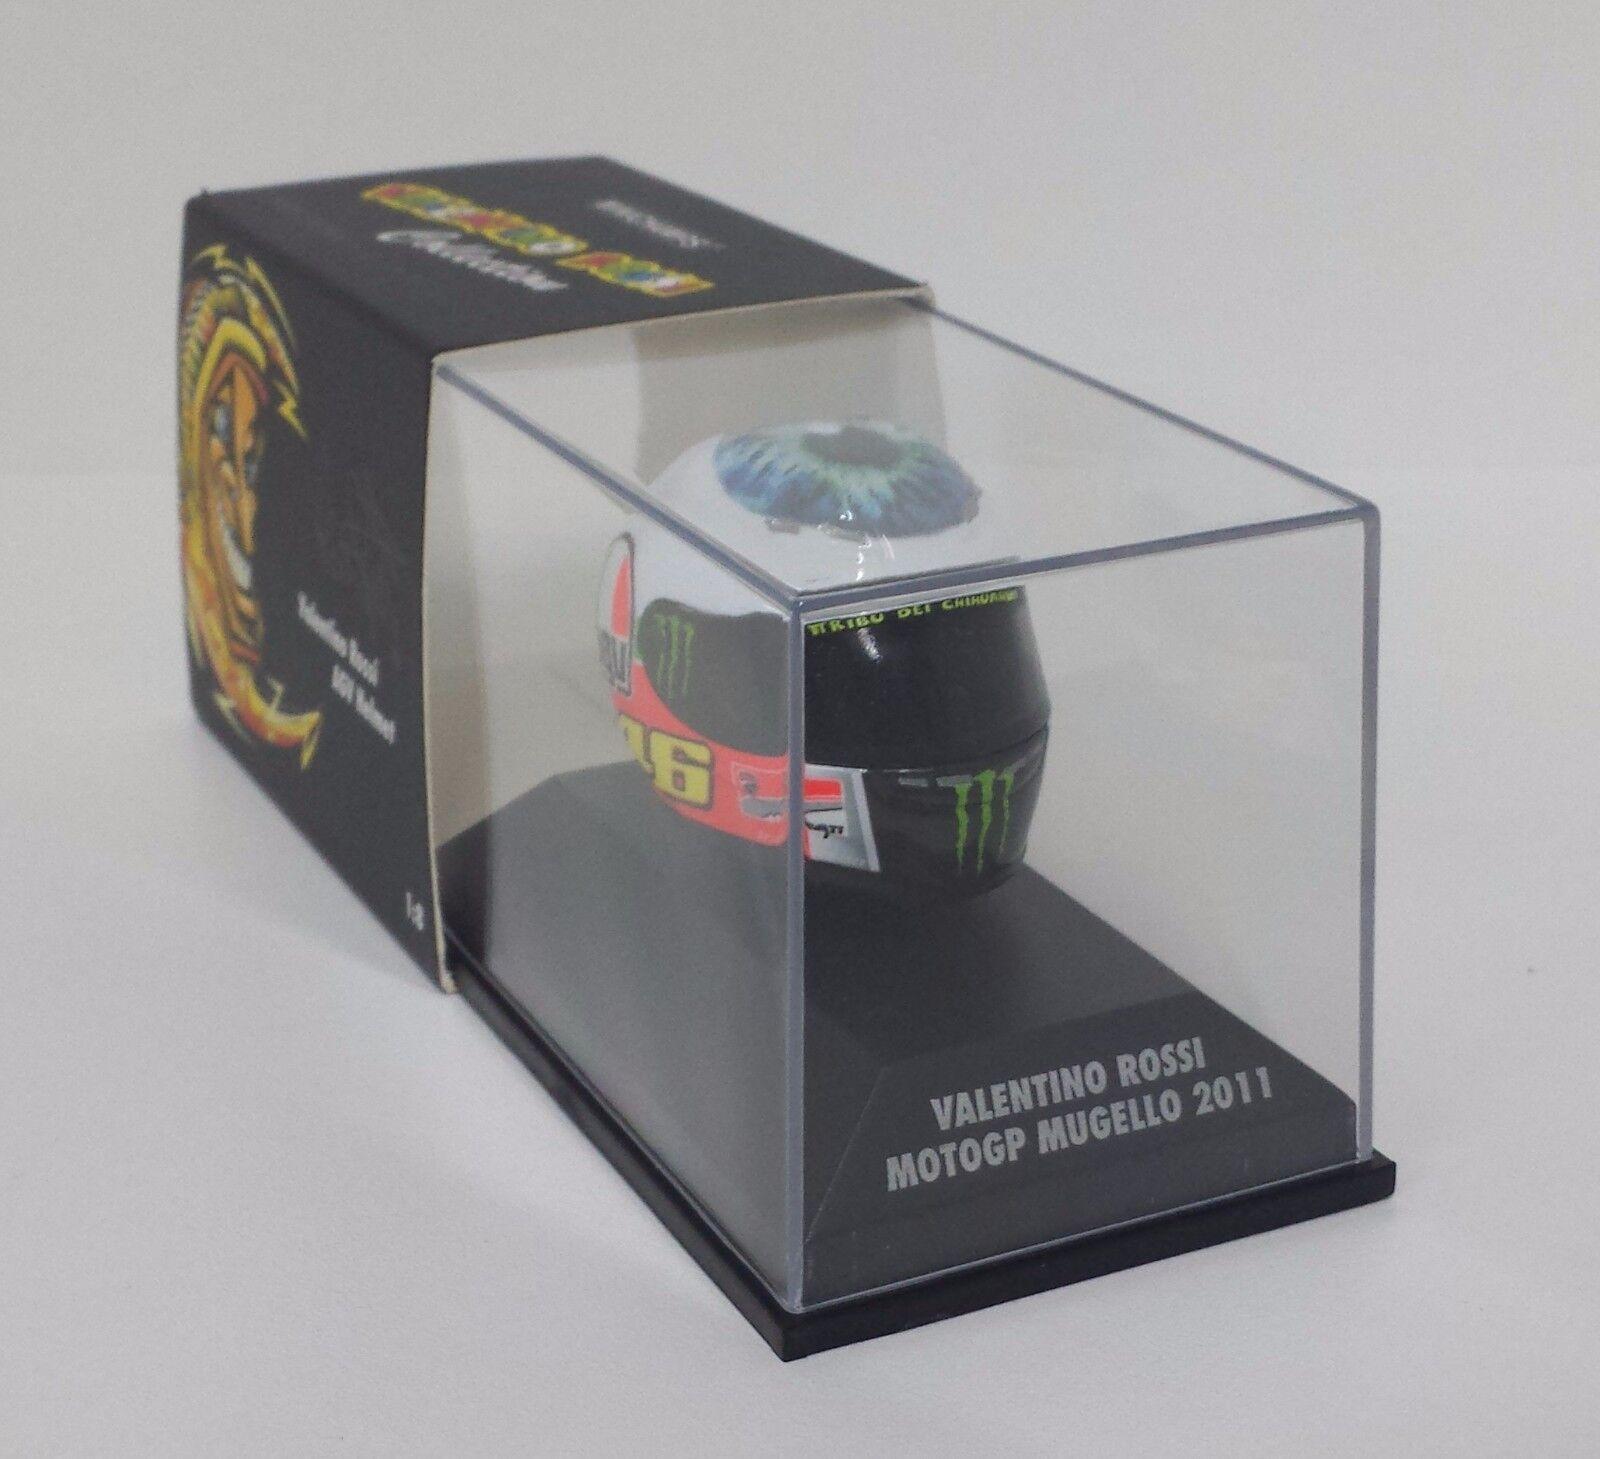 Minichamps Valentino Rossi AGV Casque Helmet 1 8 Motogp Mugello 2011   Eye